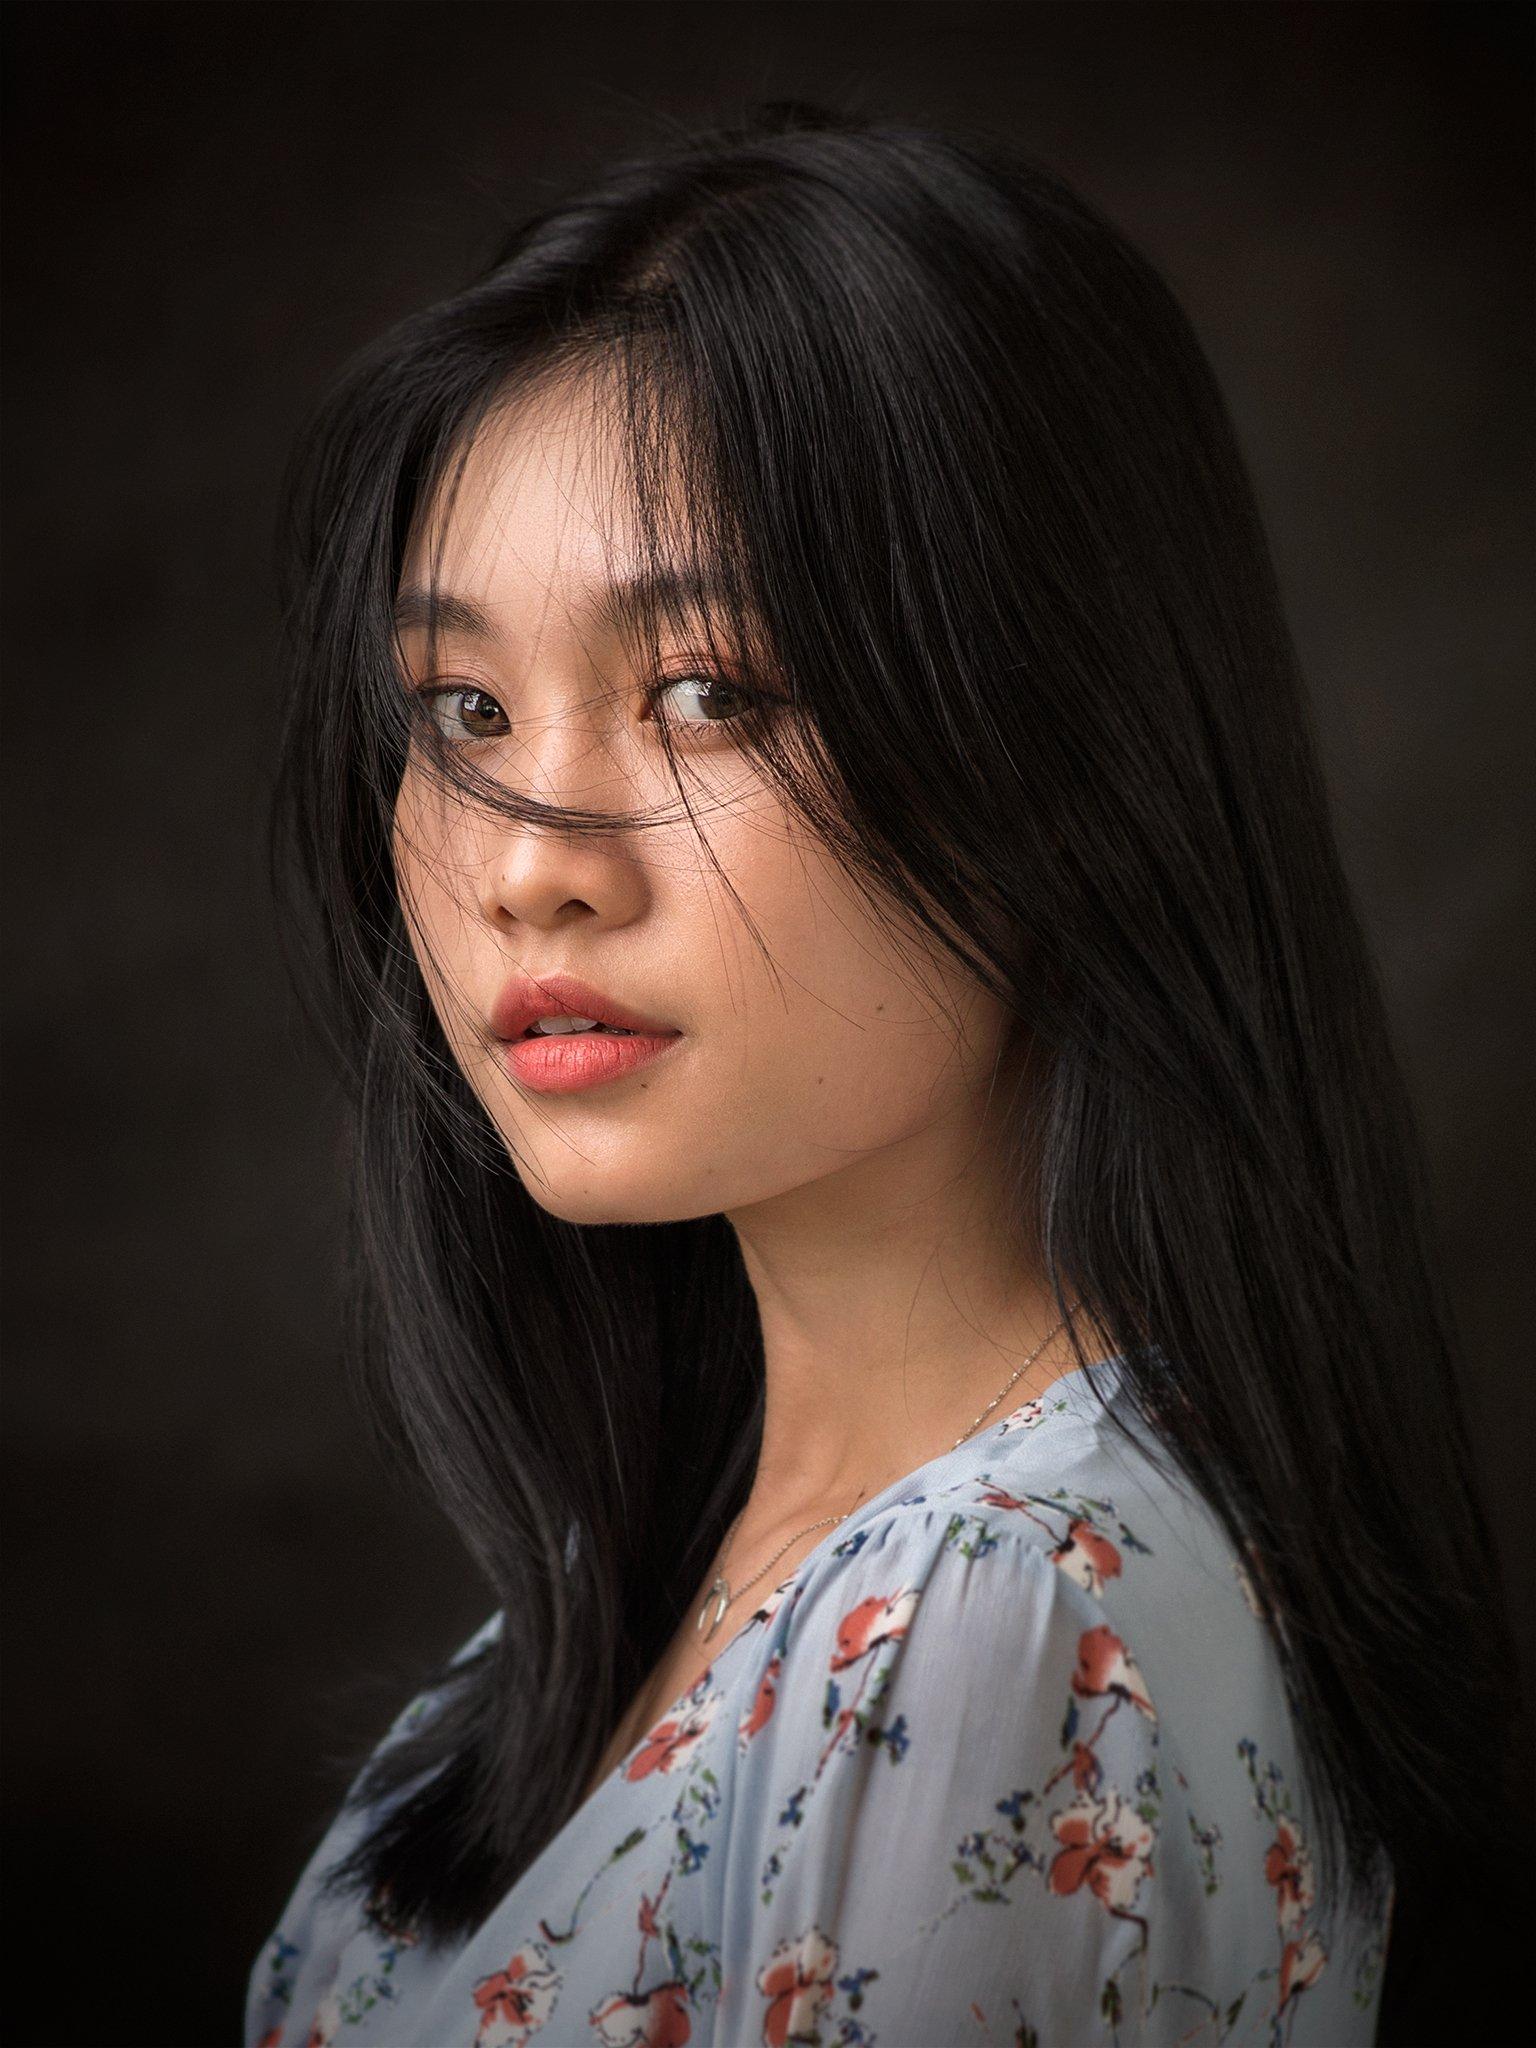 portrait, face, girl, young, beauty, mood, hair, eyes, asian, vietnam, vietnamese, glamour, mood portrait, Hoang Viet Nguyen